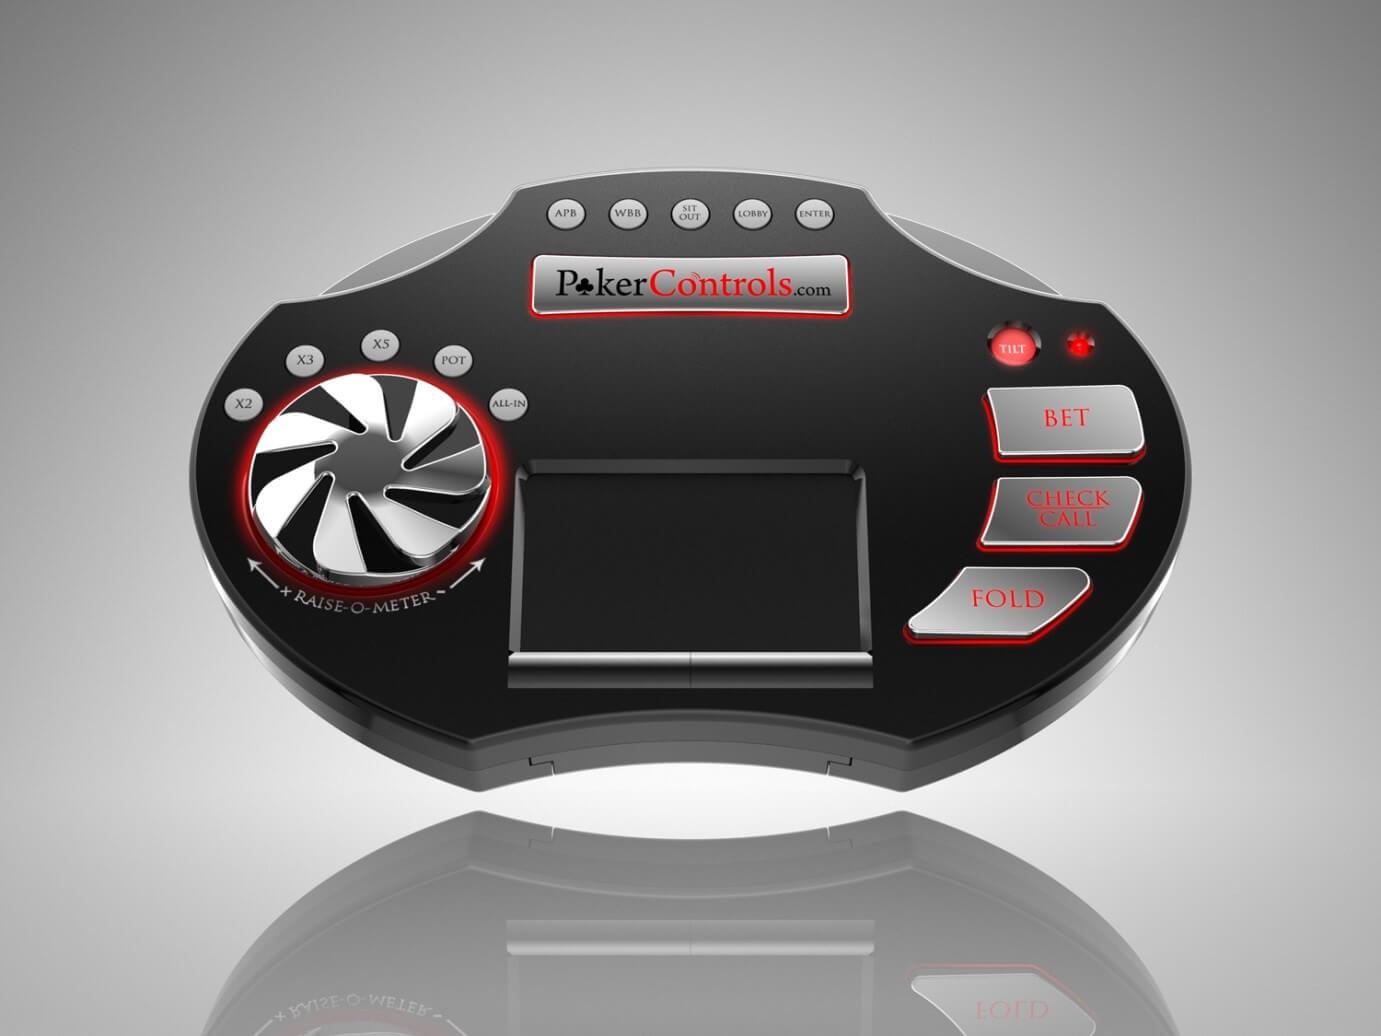 Poker Controller